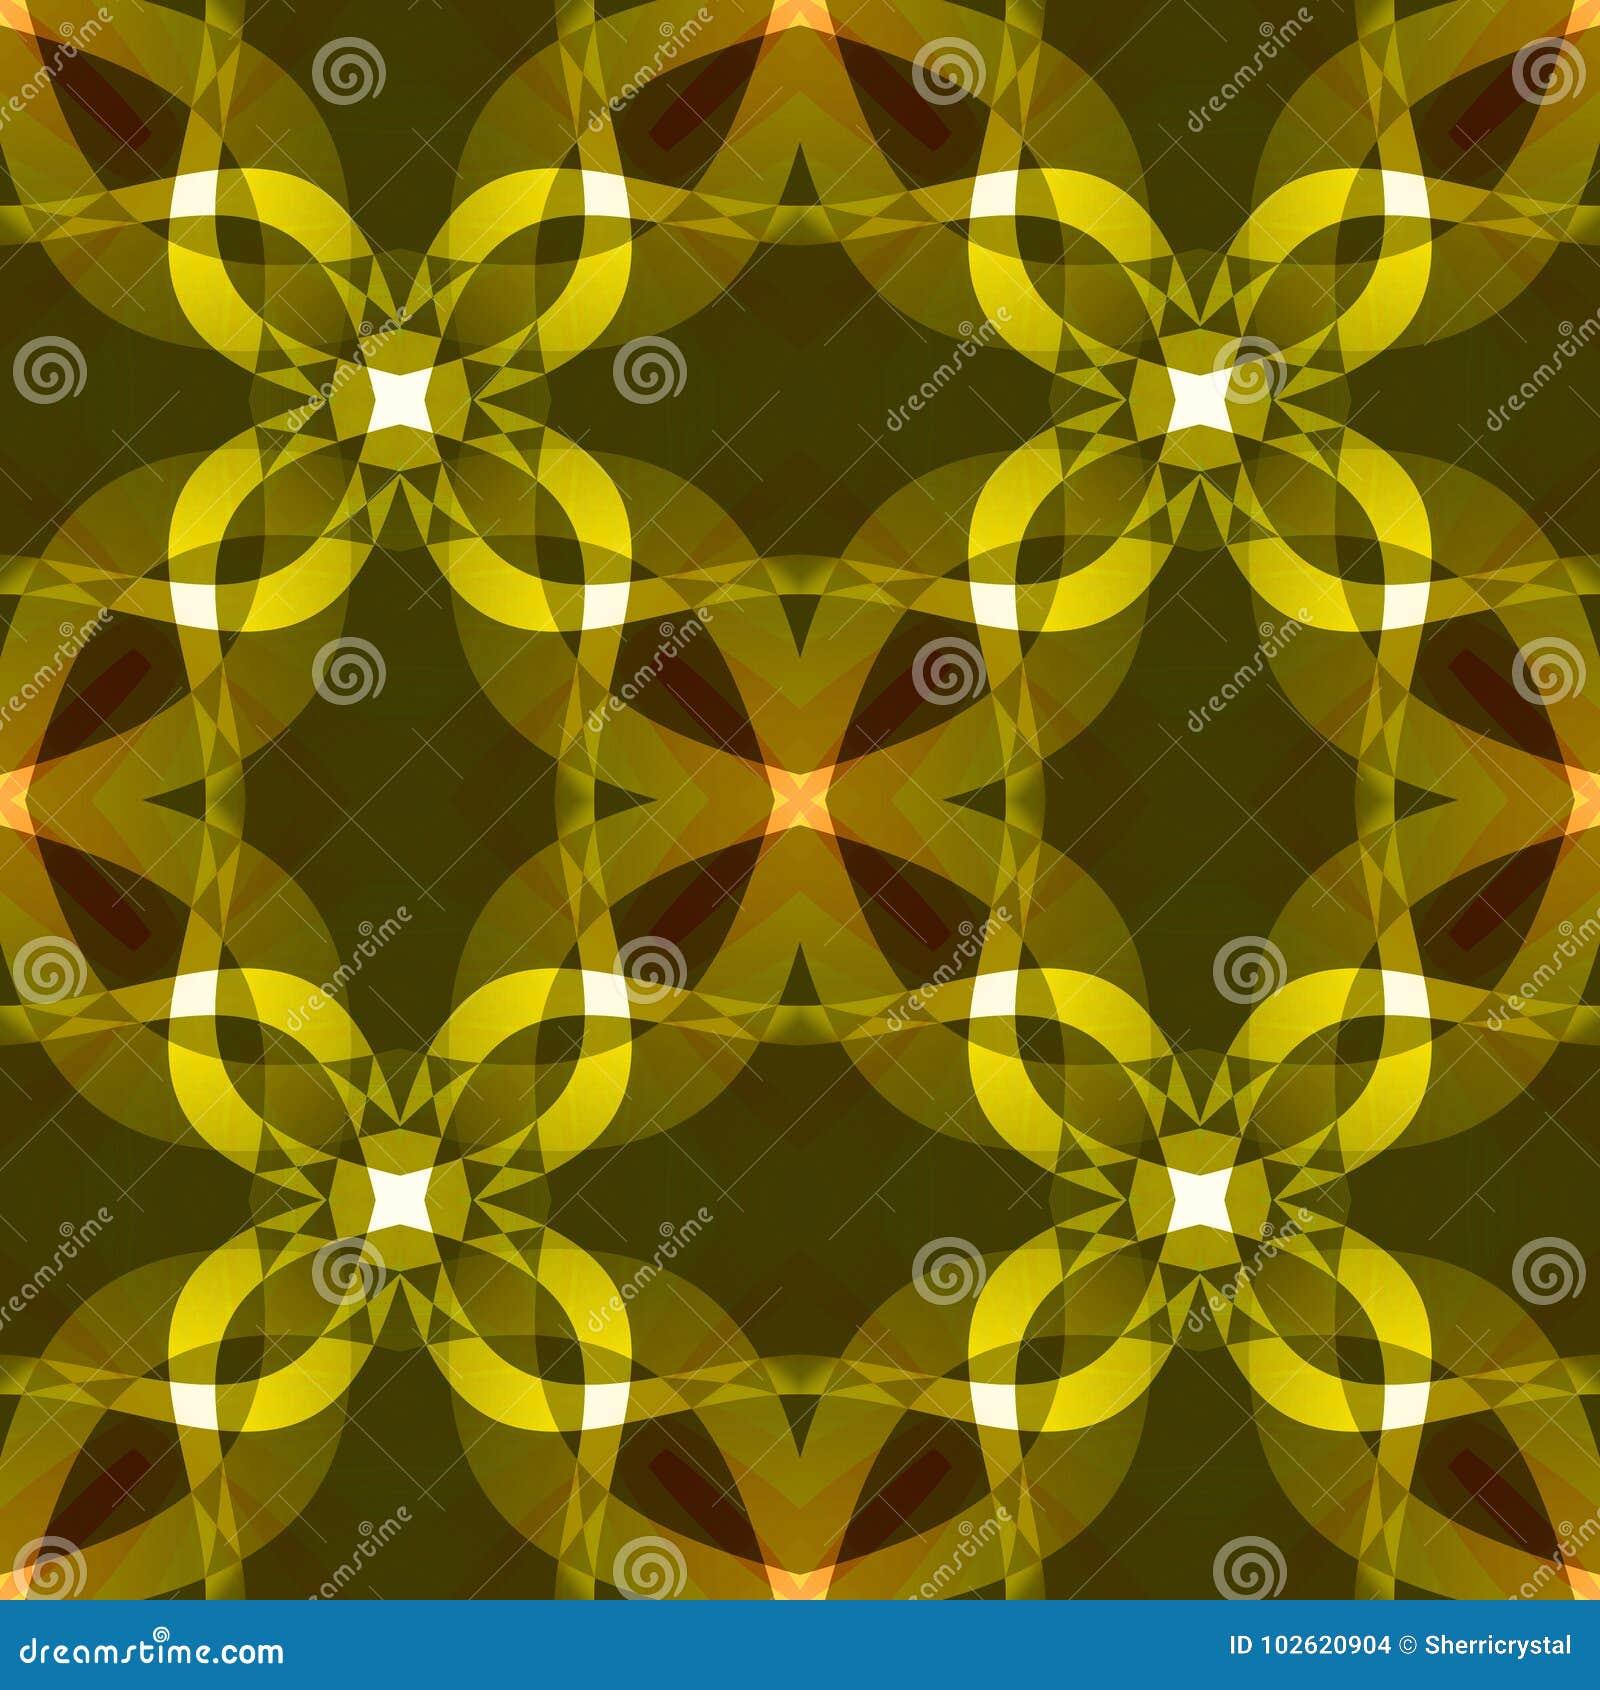 Dark Yellow Modern Abstract Texture Textile Print Pattern Detailed